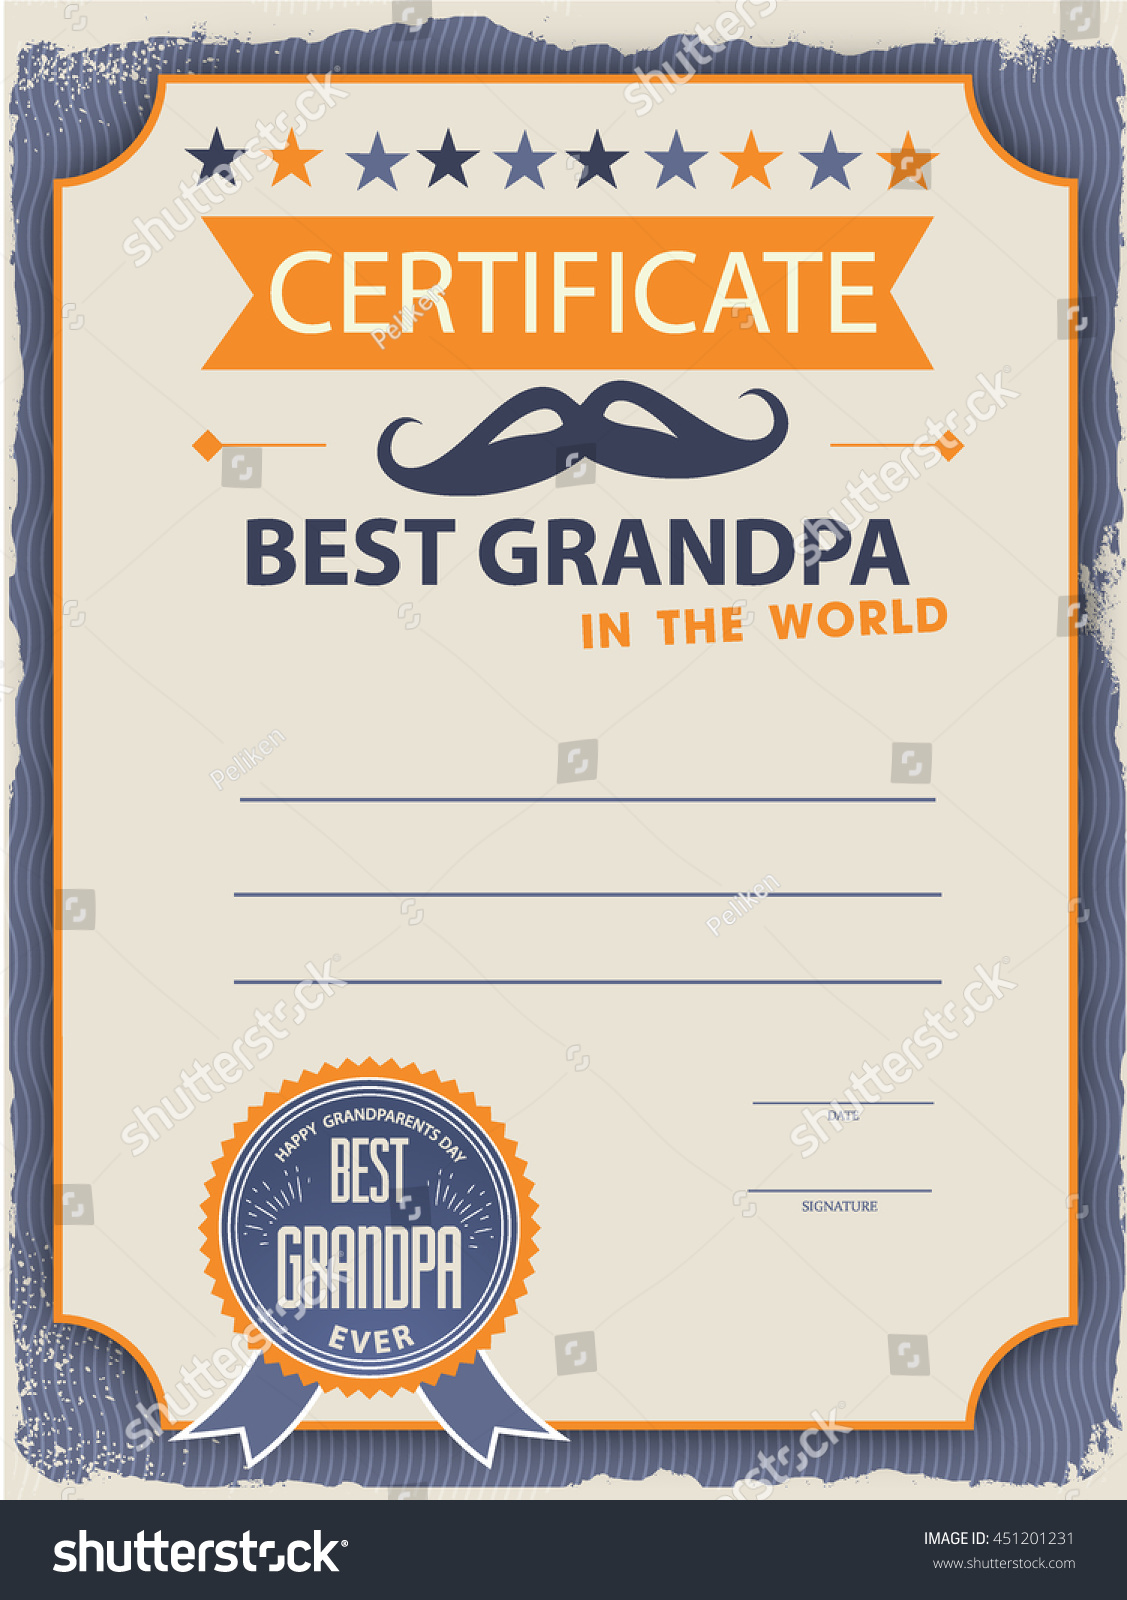 template certificate diploma congratulations happy grandparents